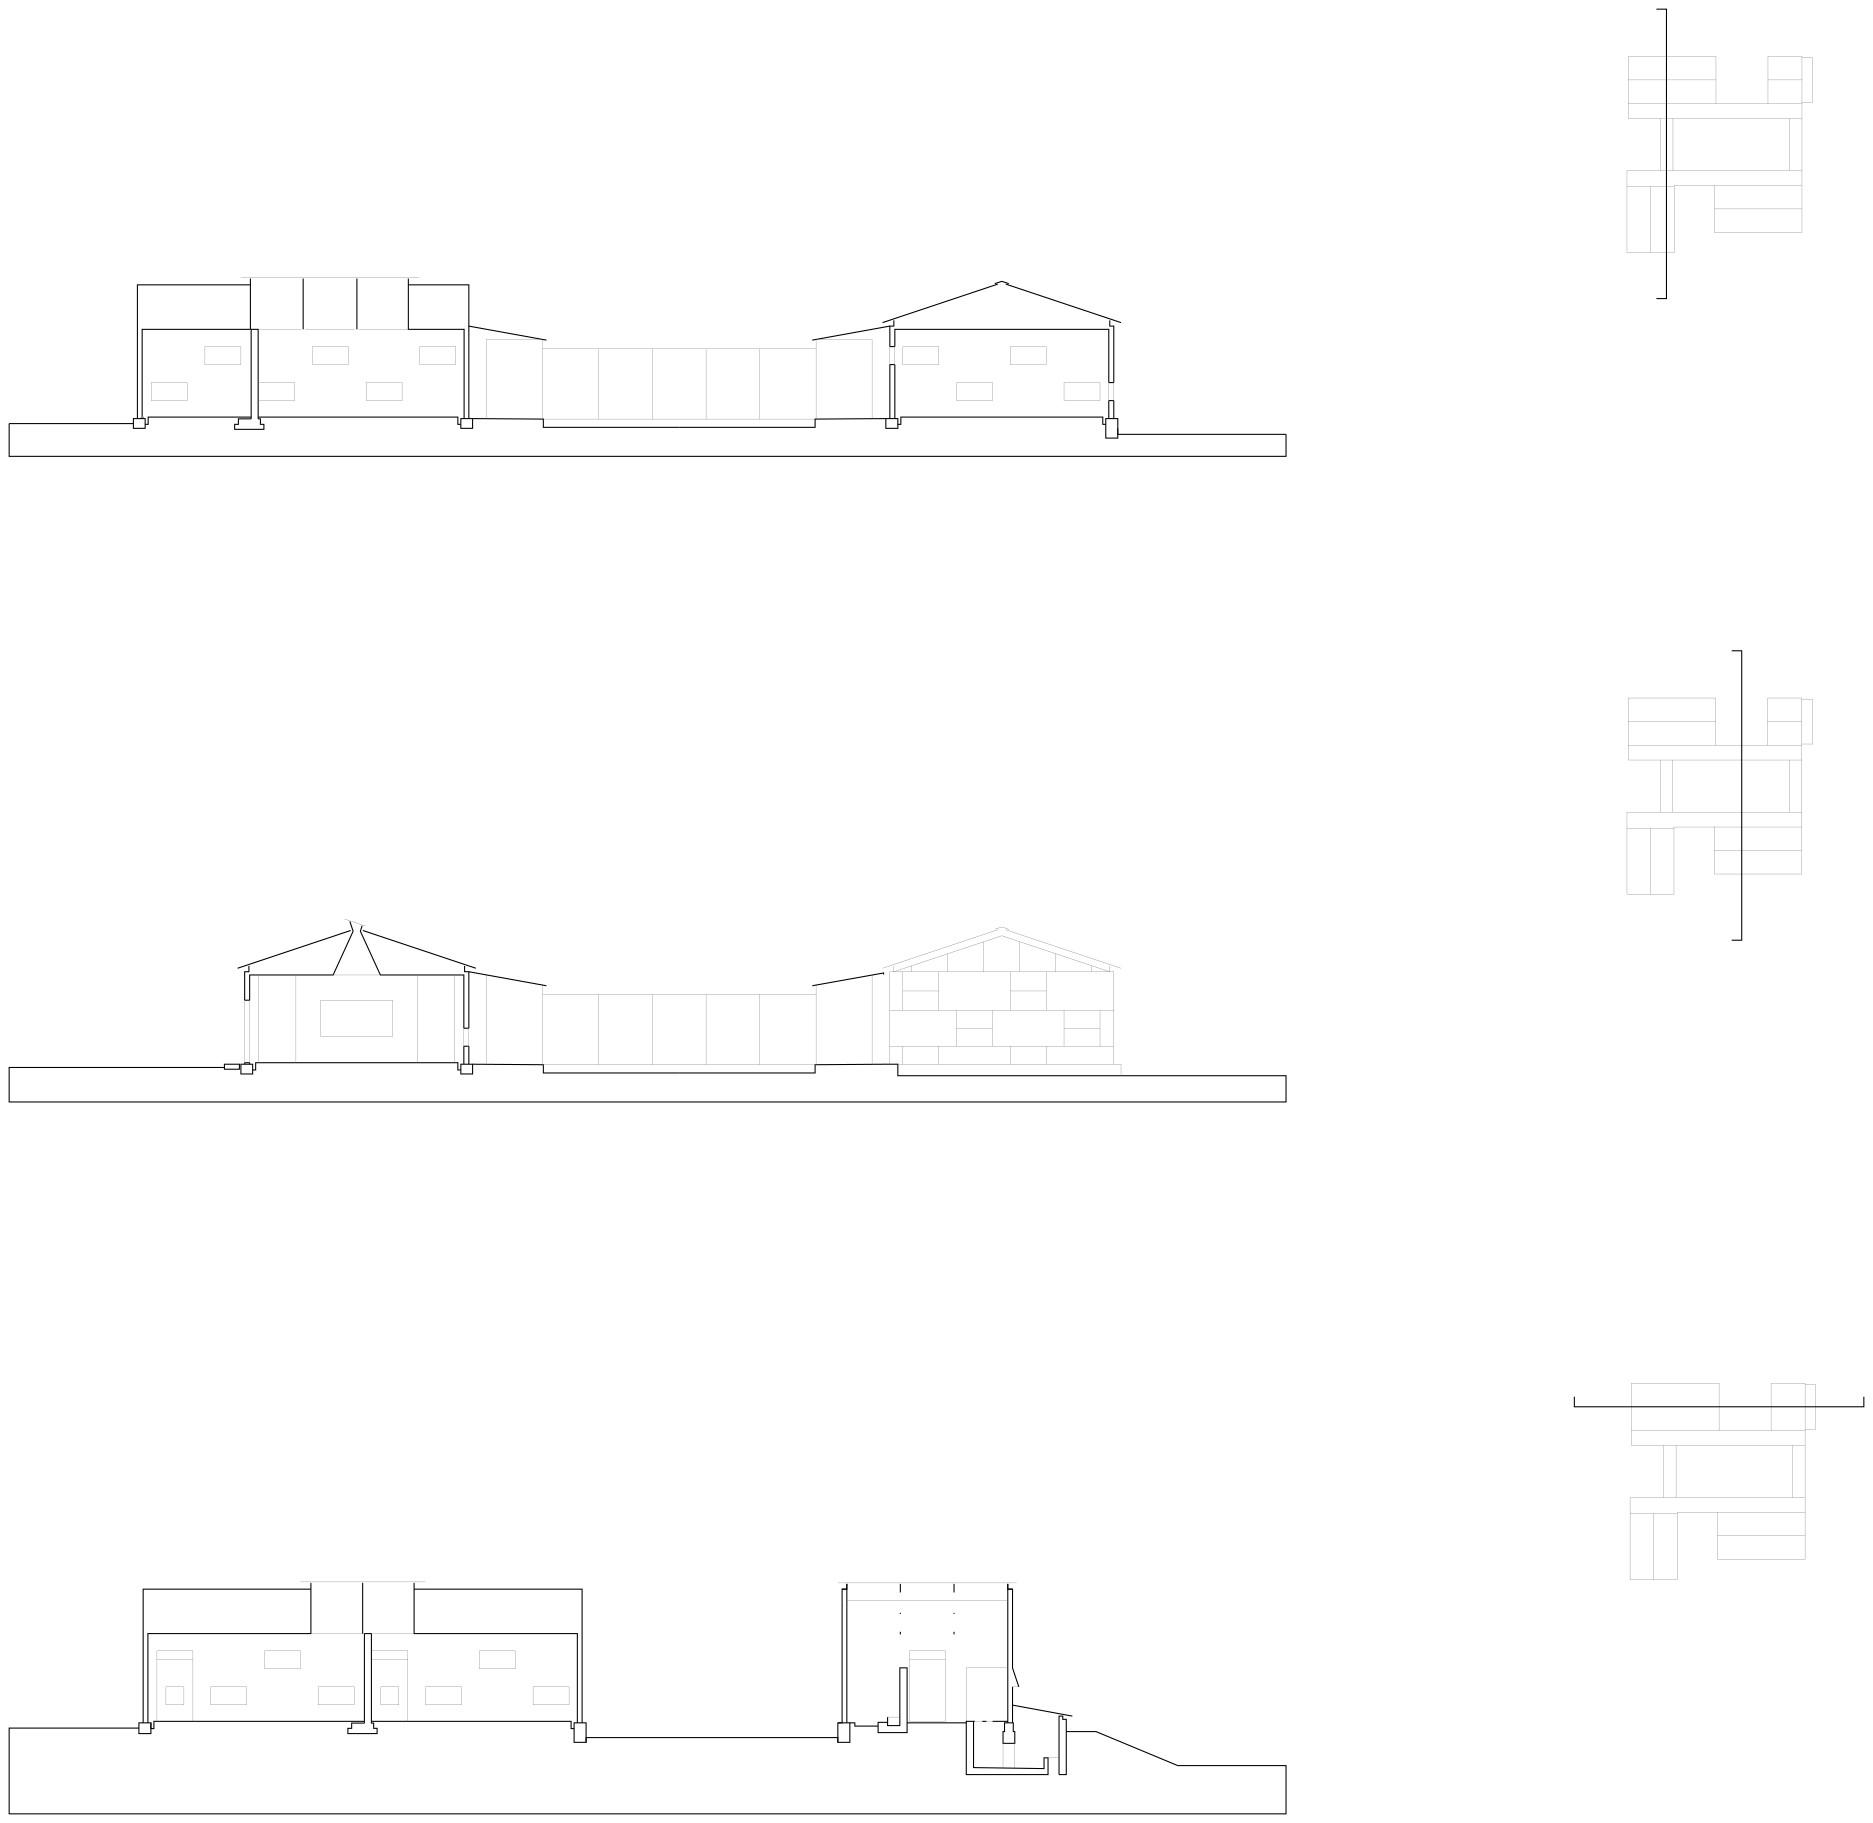 P01-XS-Section-1_400.jpg